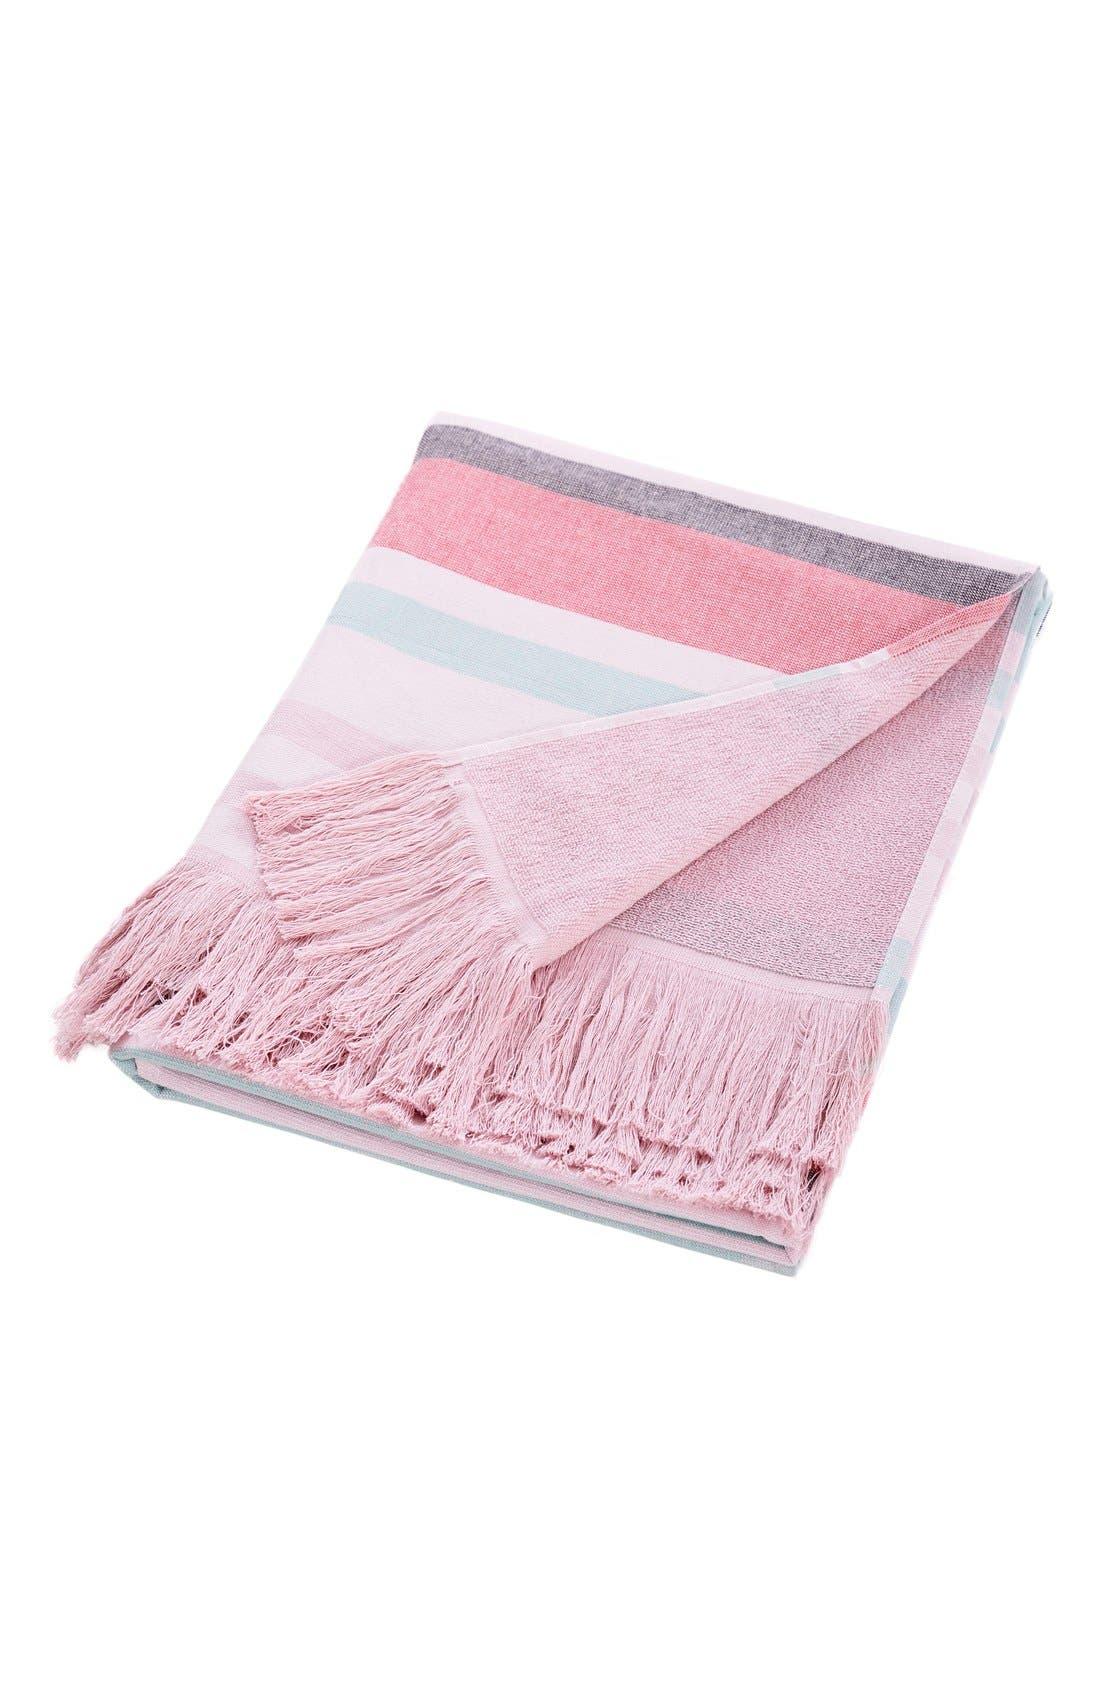 Main Image - Linum Home Textiles 'Amalfi' Turkish Pestemal Towel